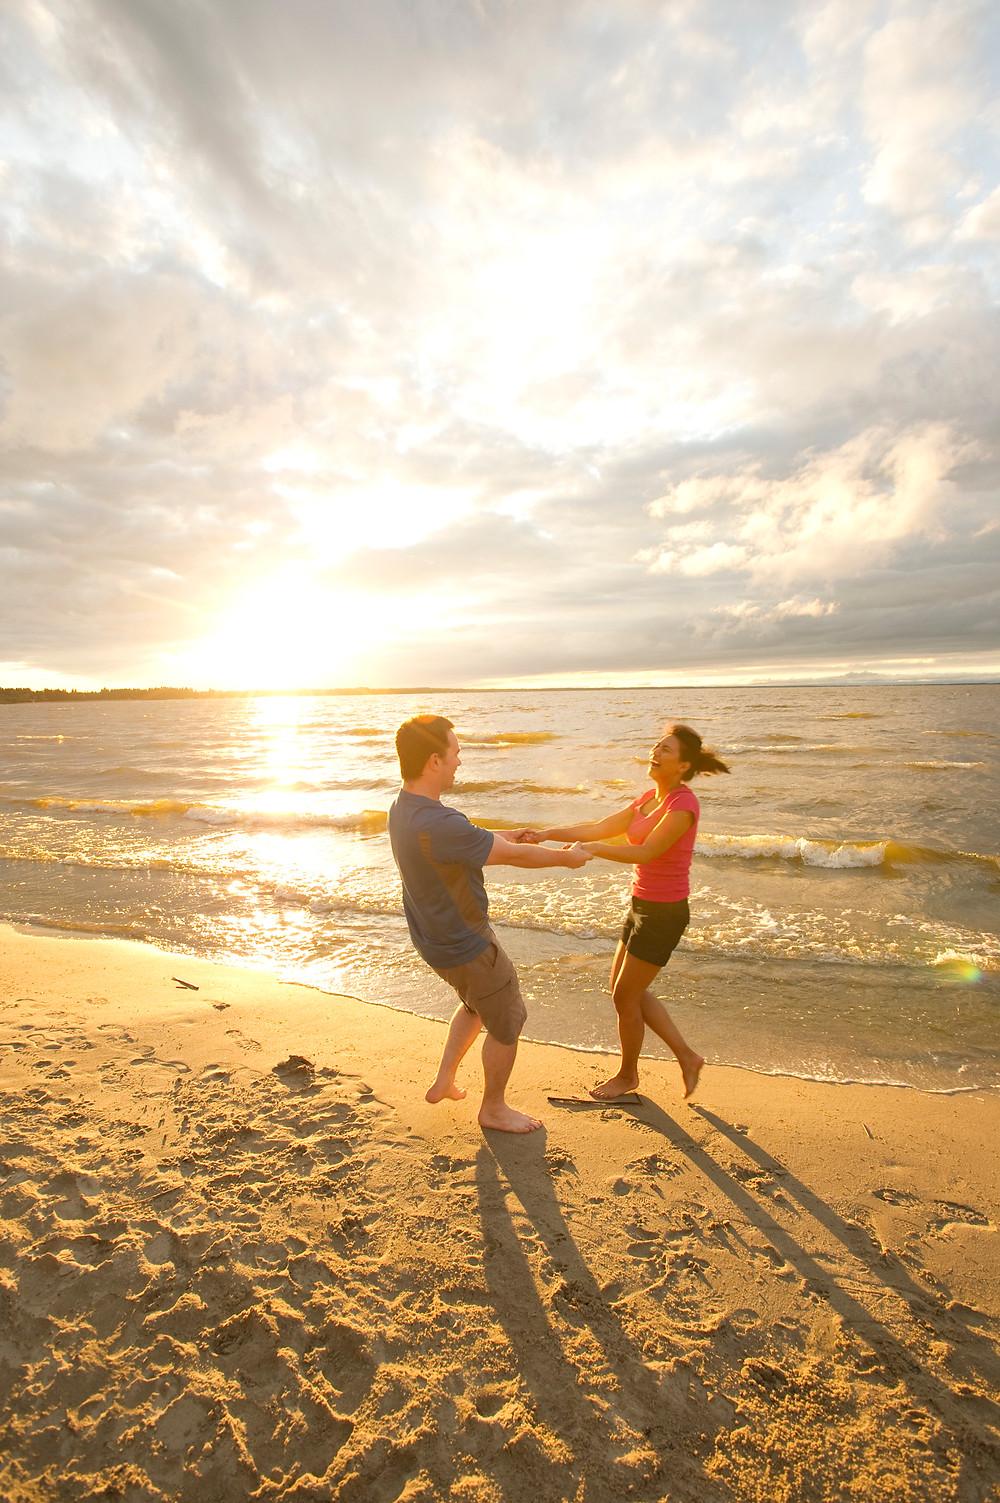 beach water lake Saskatchewan fun Spaß Strand Wasser See Badeurlaub Strandurlaub Sommer Sonne summer sun sunrise sunset Sonnenaufgang Sonnenuntergang love Liebe happy happiness Glück Entspannung Sandstrand